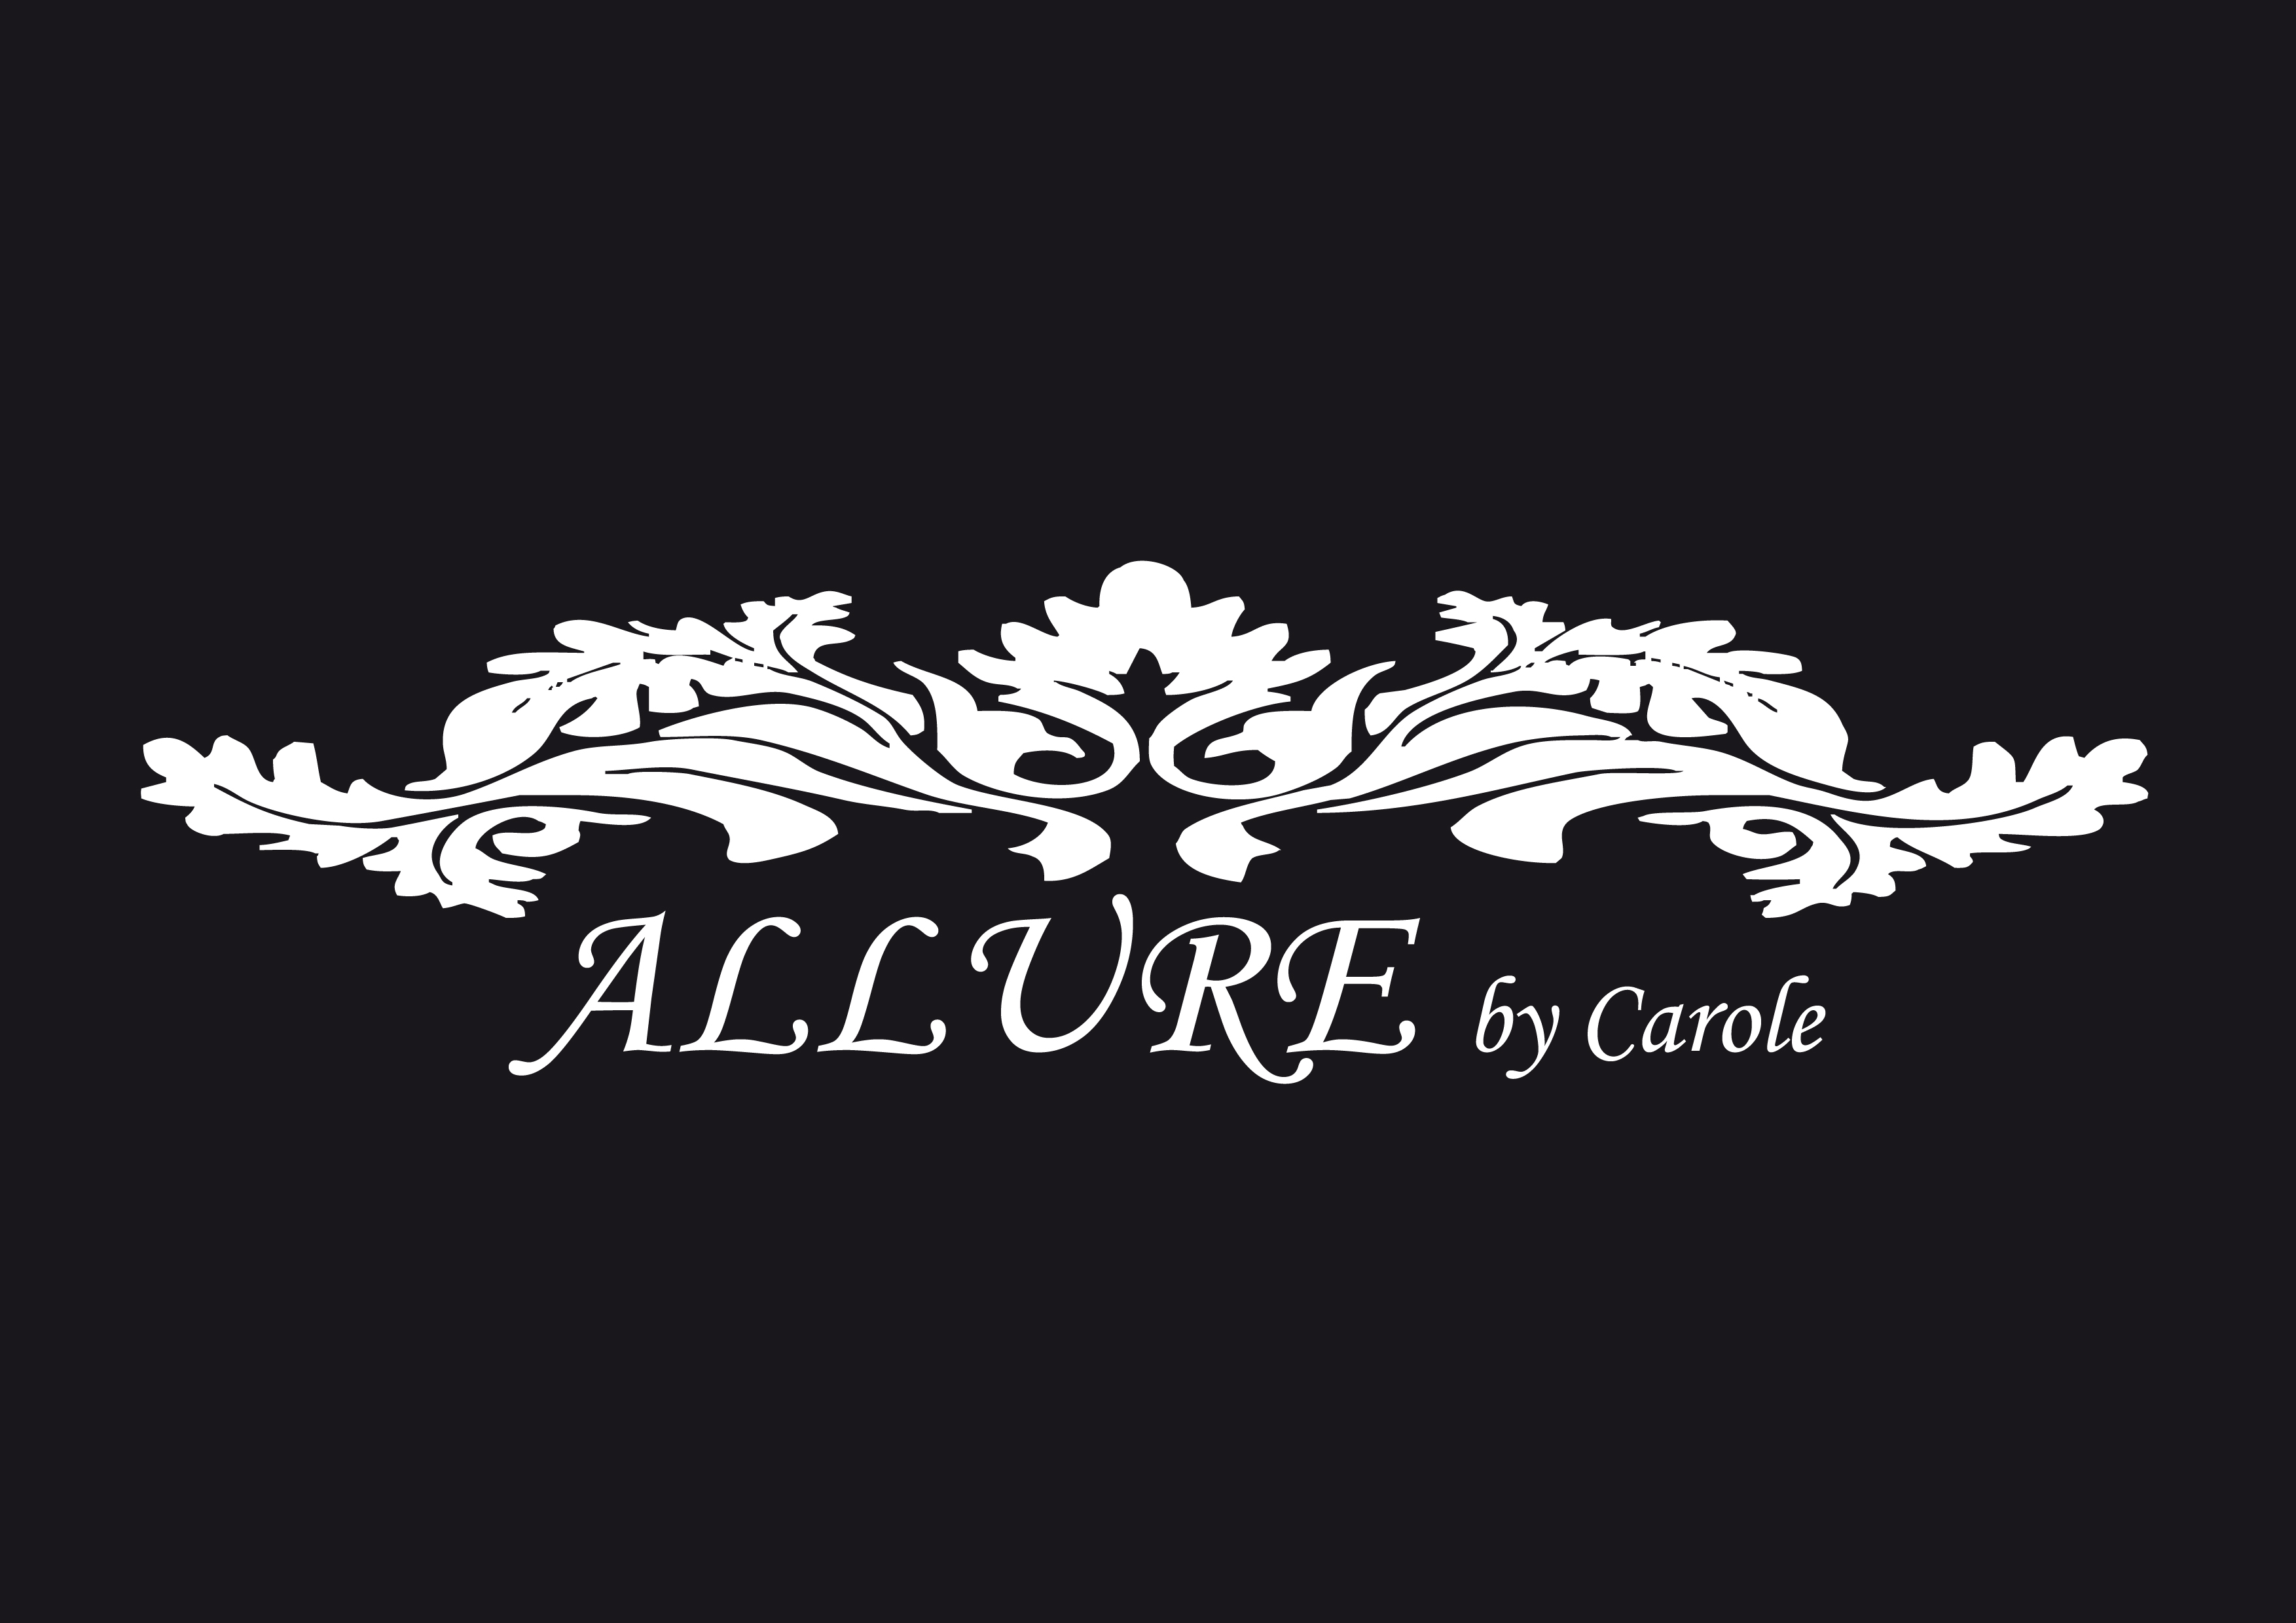 Allure by Carole